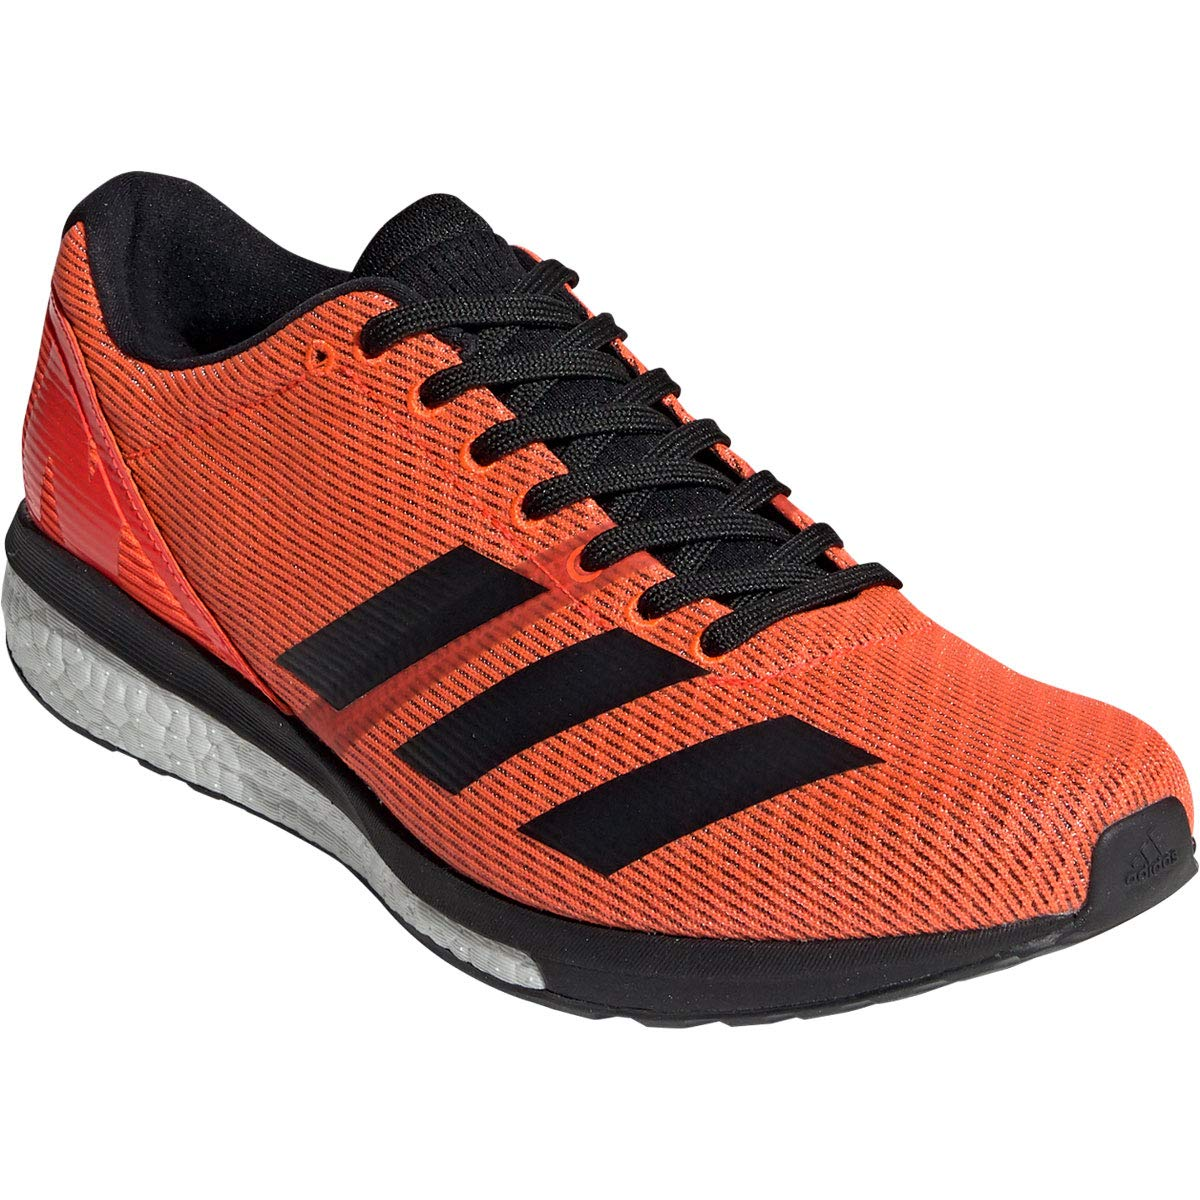 Rouge 46.5 EU adidas Adizero Boston 8 M M, Chaussures de Trail Homme